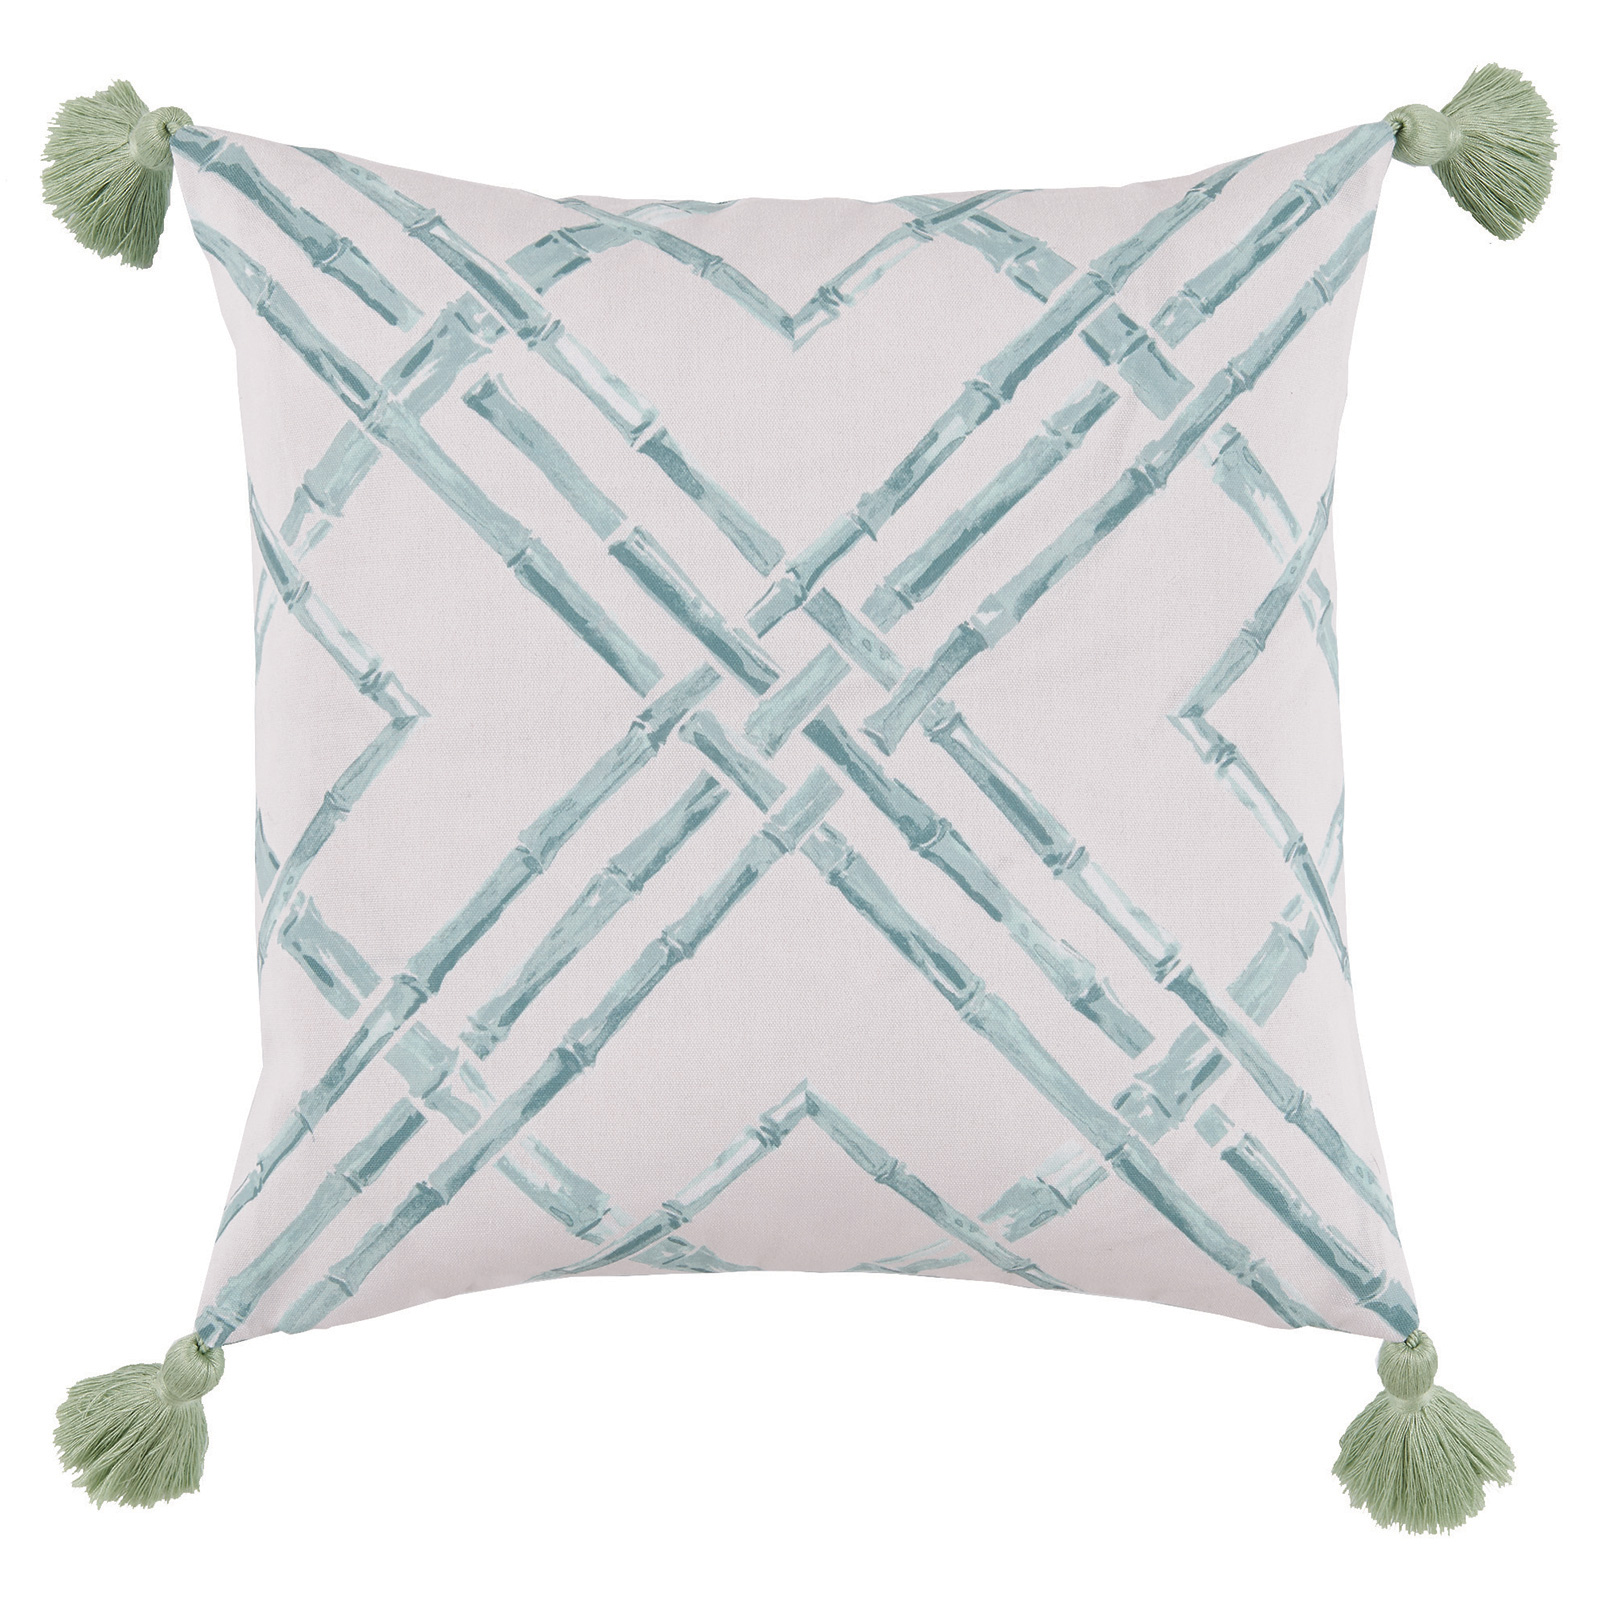 Mumbi Bazaar Mineral Bamboo Tassel Outdoor Pillow - 20x20